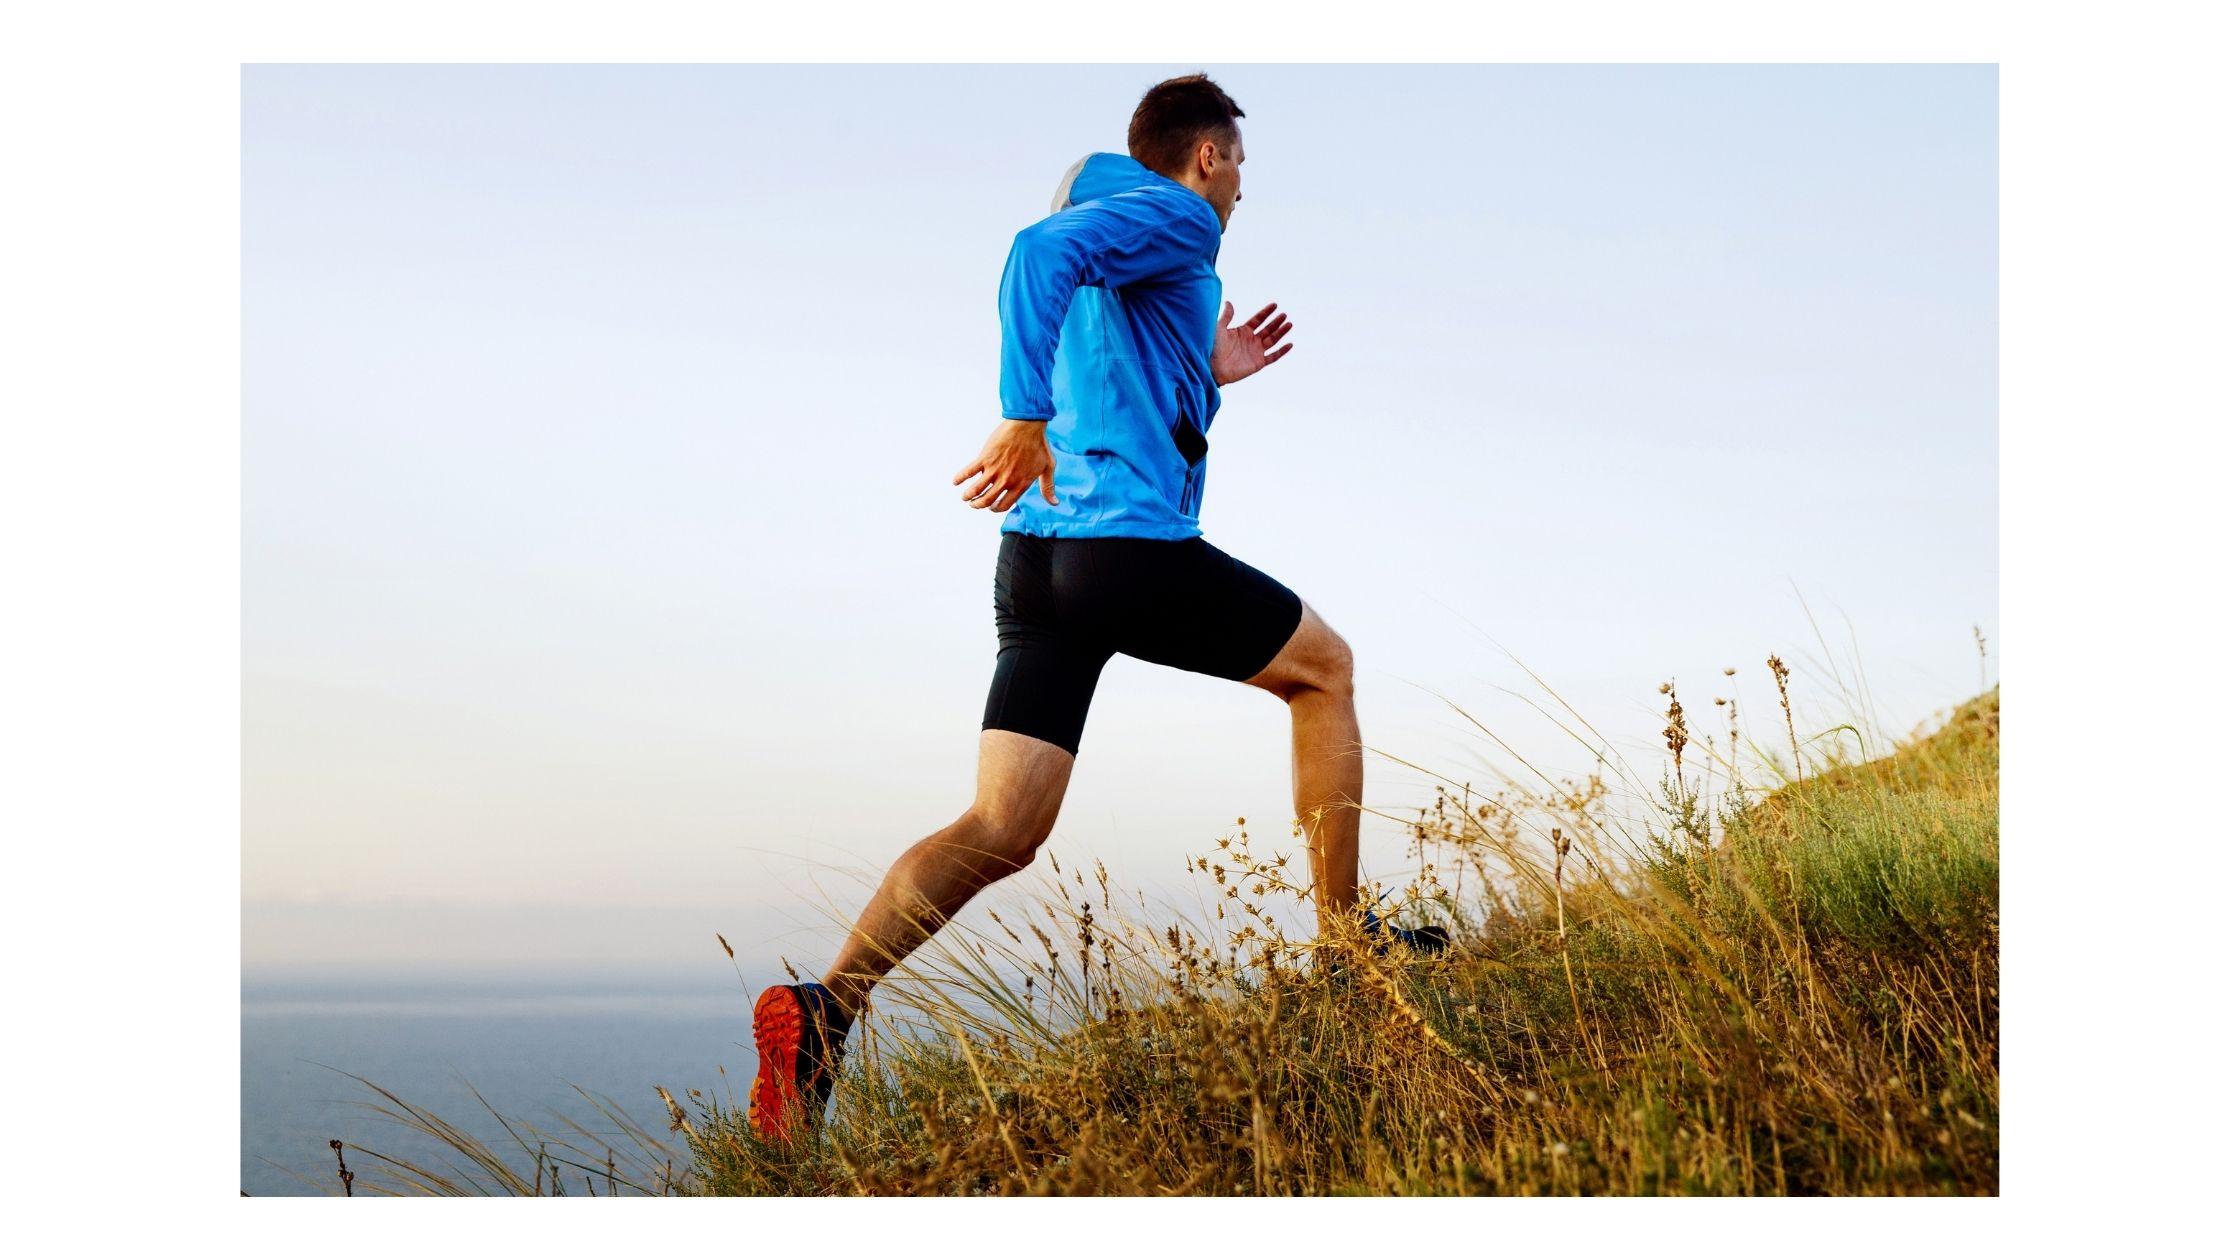 corsa-in-salita-allenamento-benefici-runners